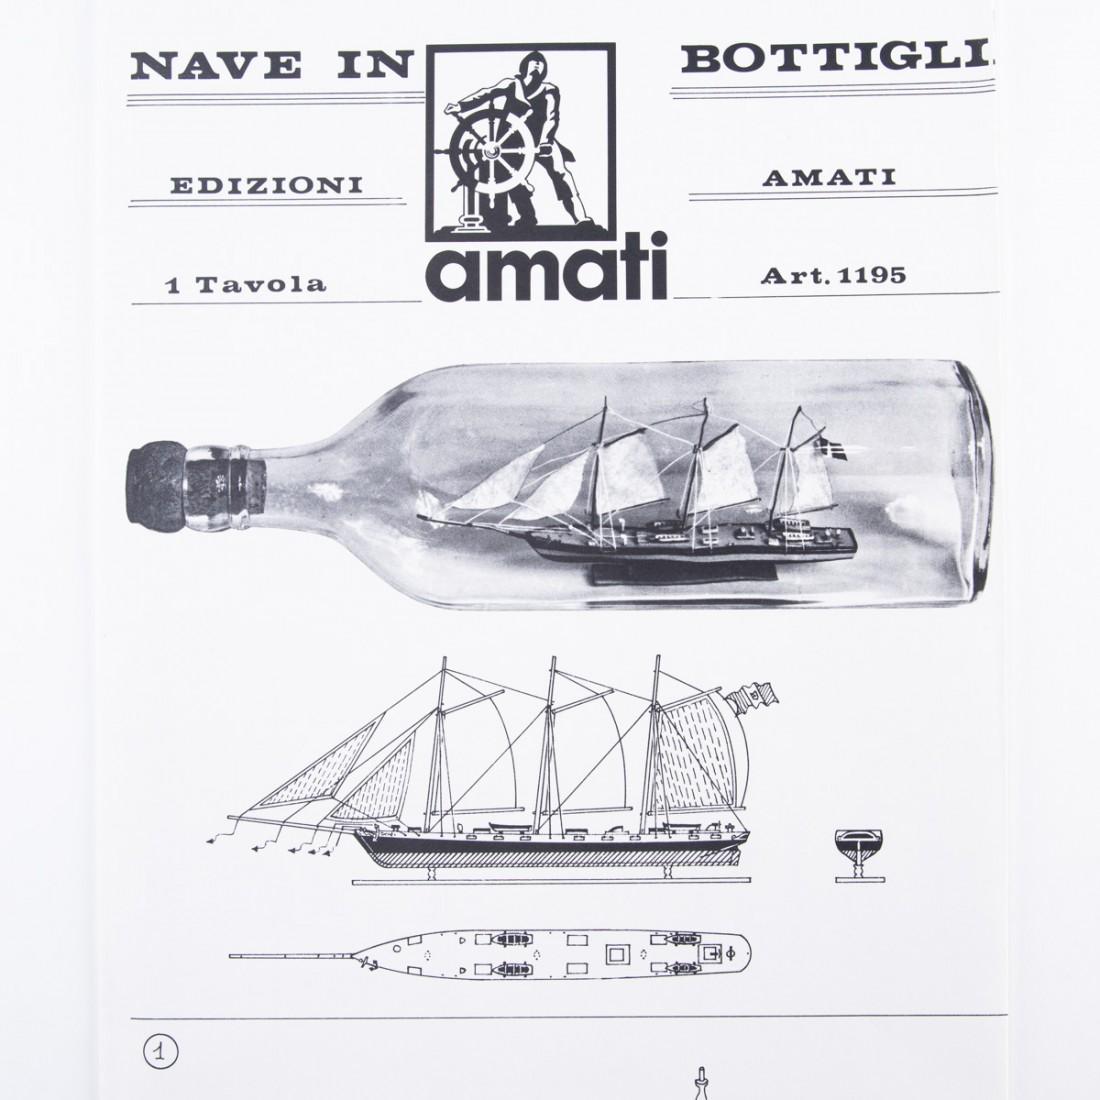 Enviar en un plan de botella